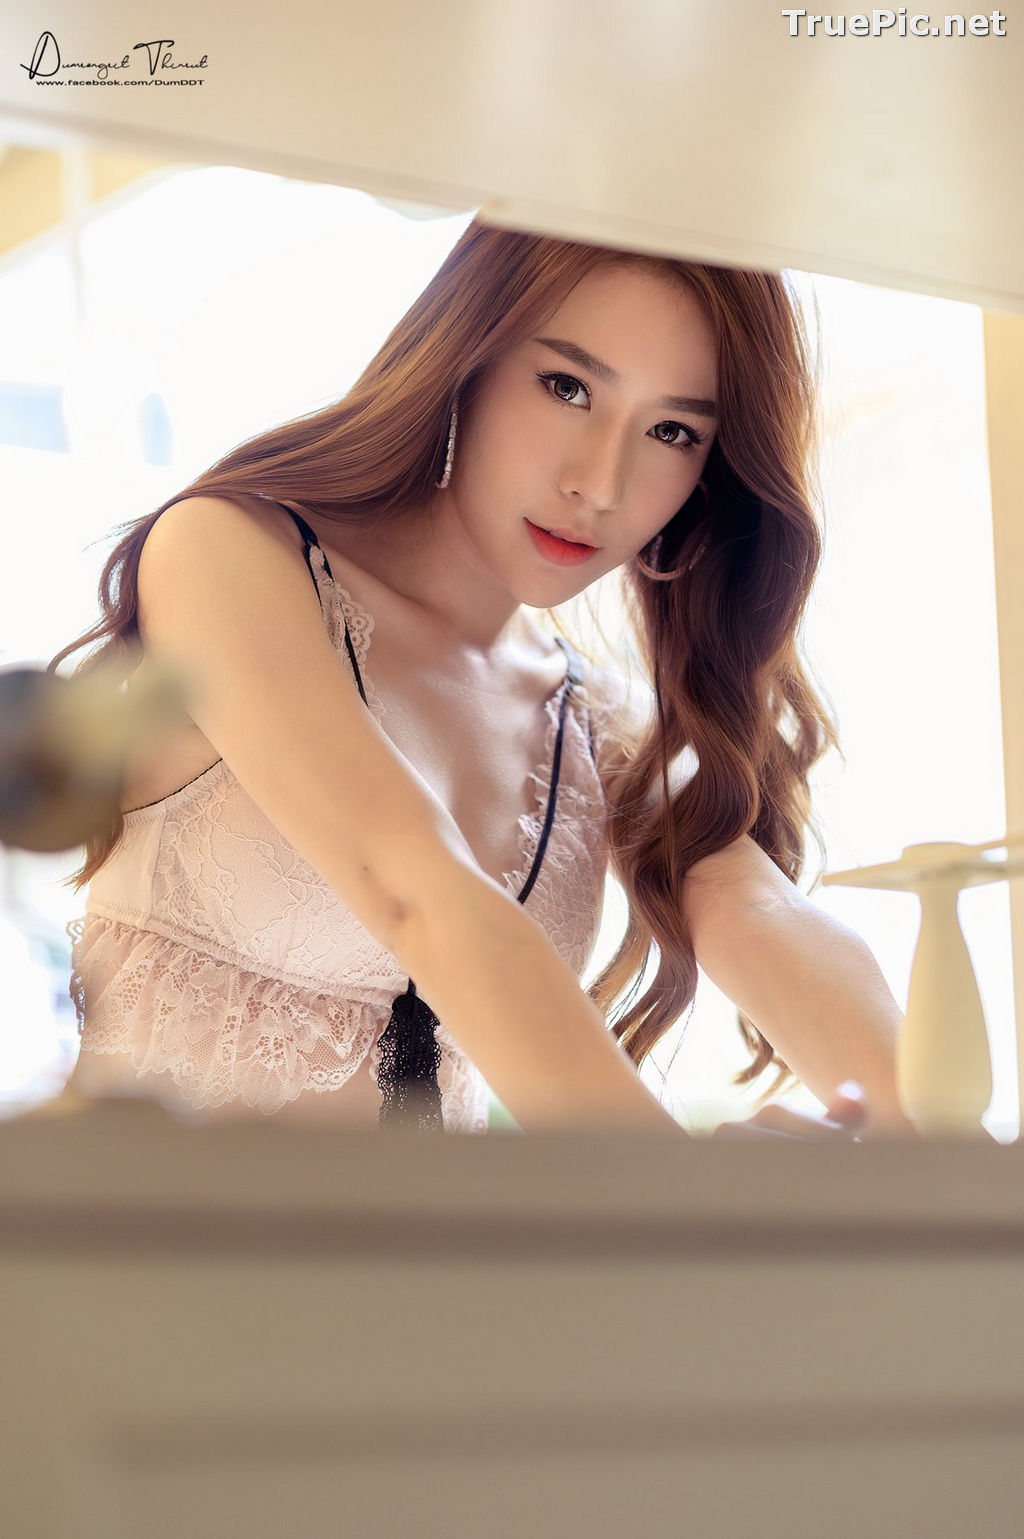 Image Thailand Model - Thipsuda Jitaree - I Am a Beautiful Princess - TruePic.net - Picture-3